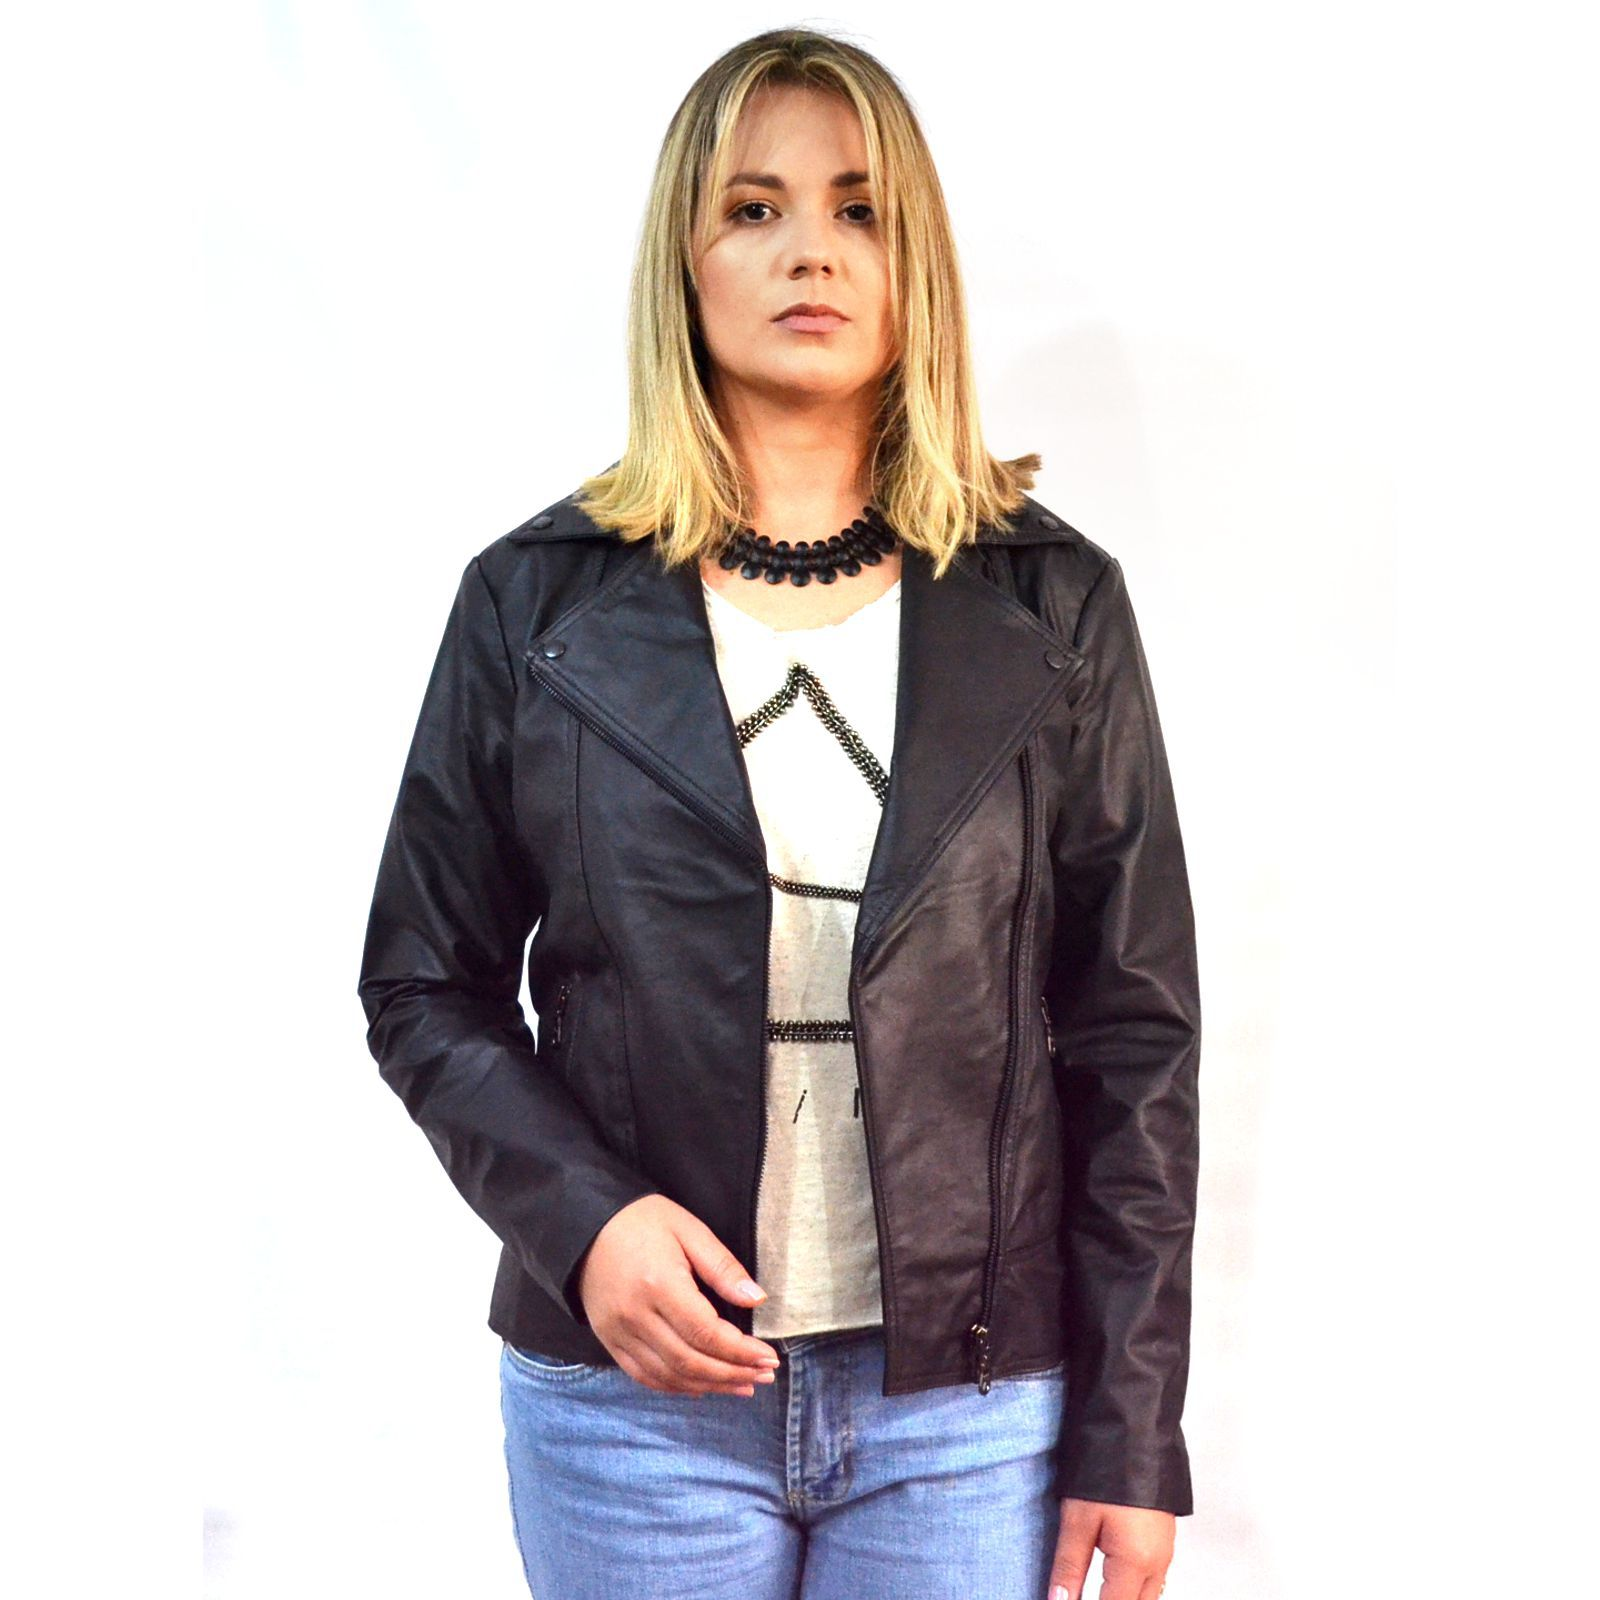 Jaqueta Feminina Prata Couro 201 Preto